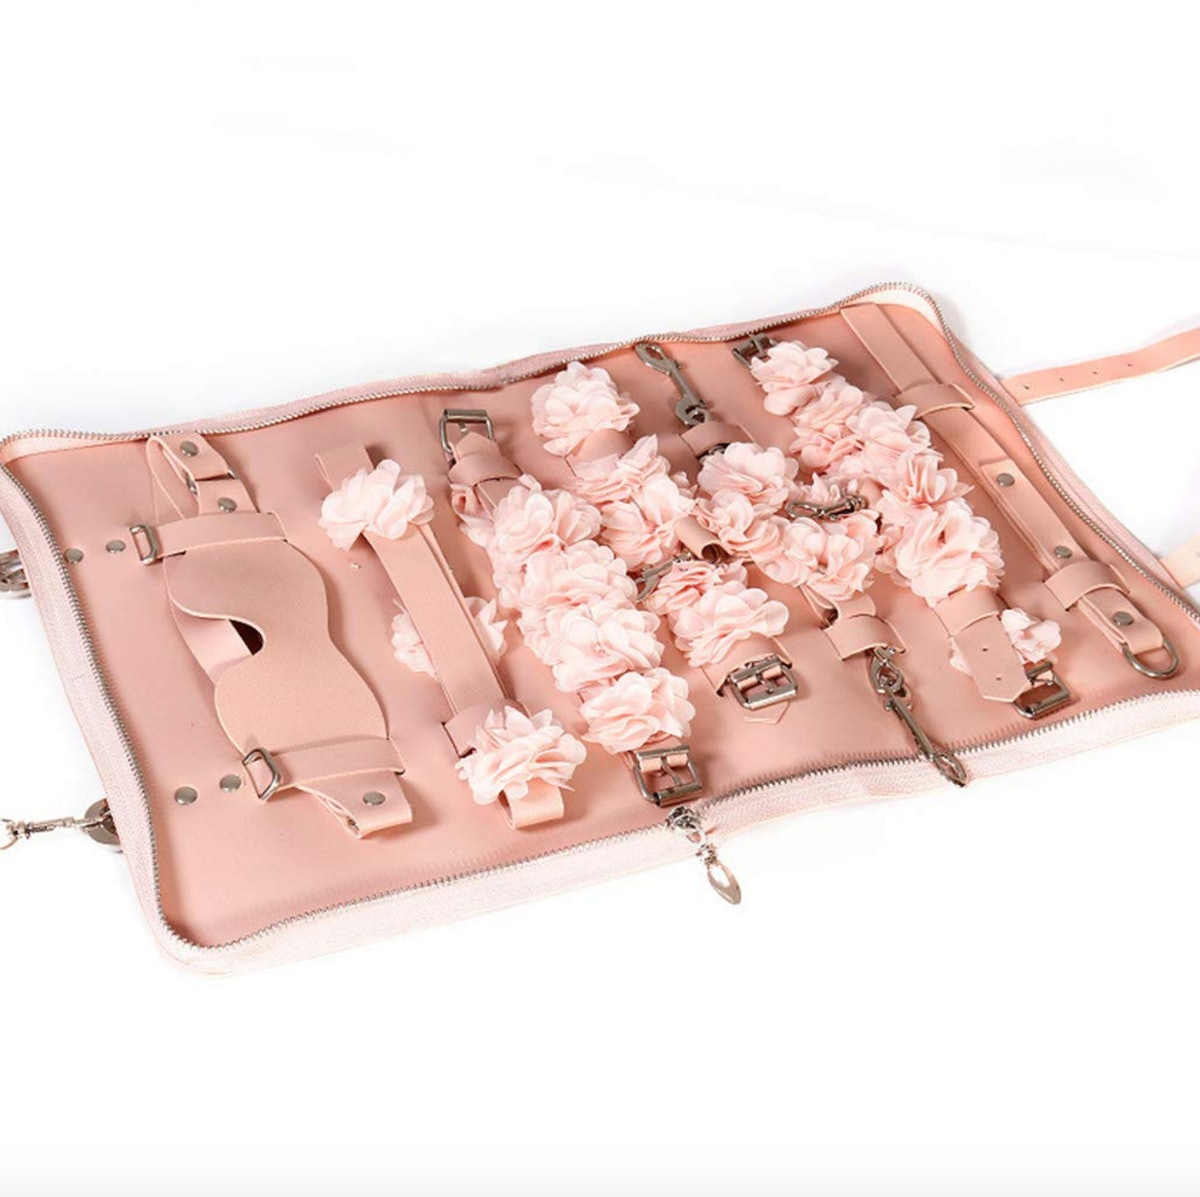 BDSM Toys Kit for Couple - Flower Shapes